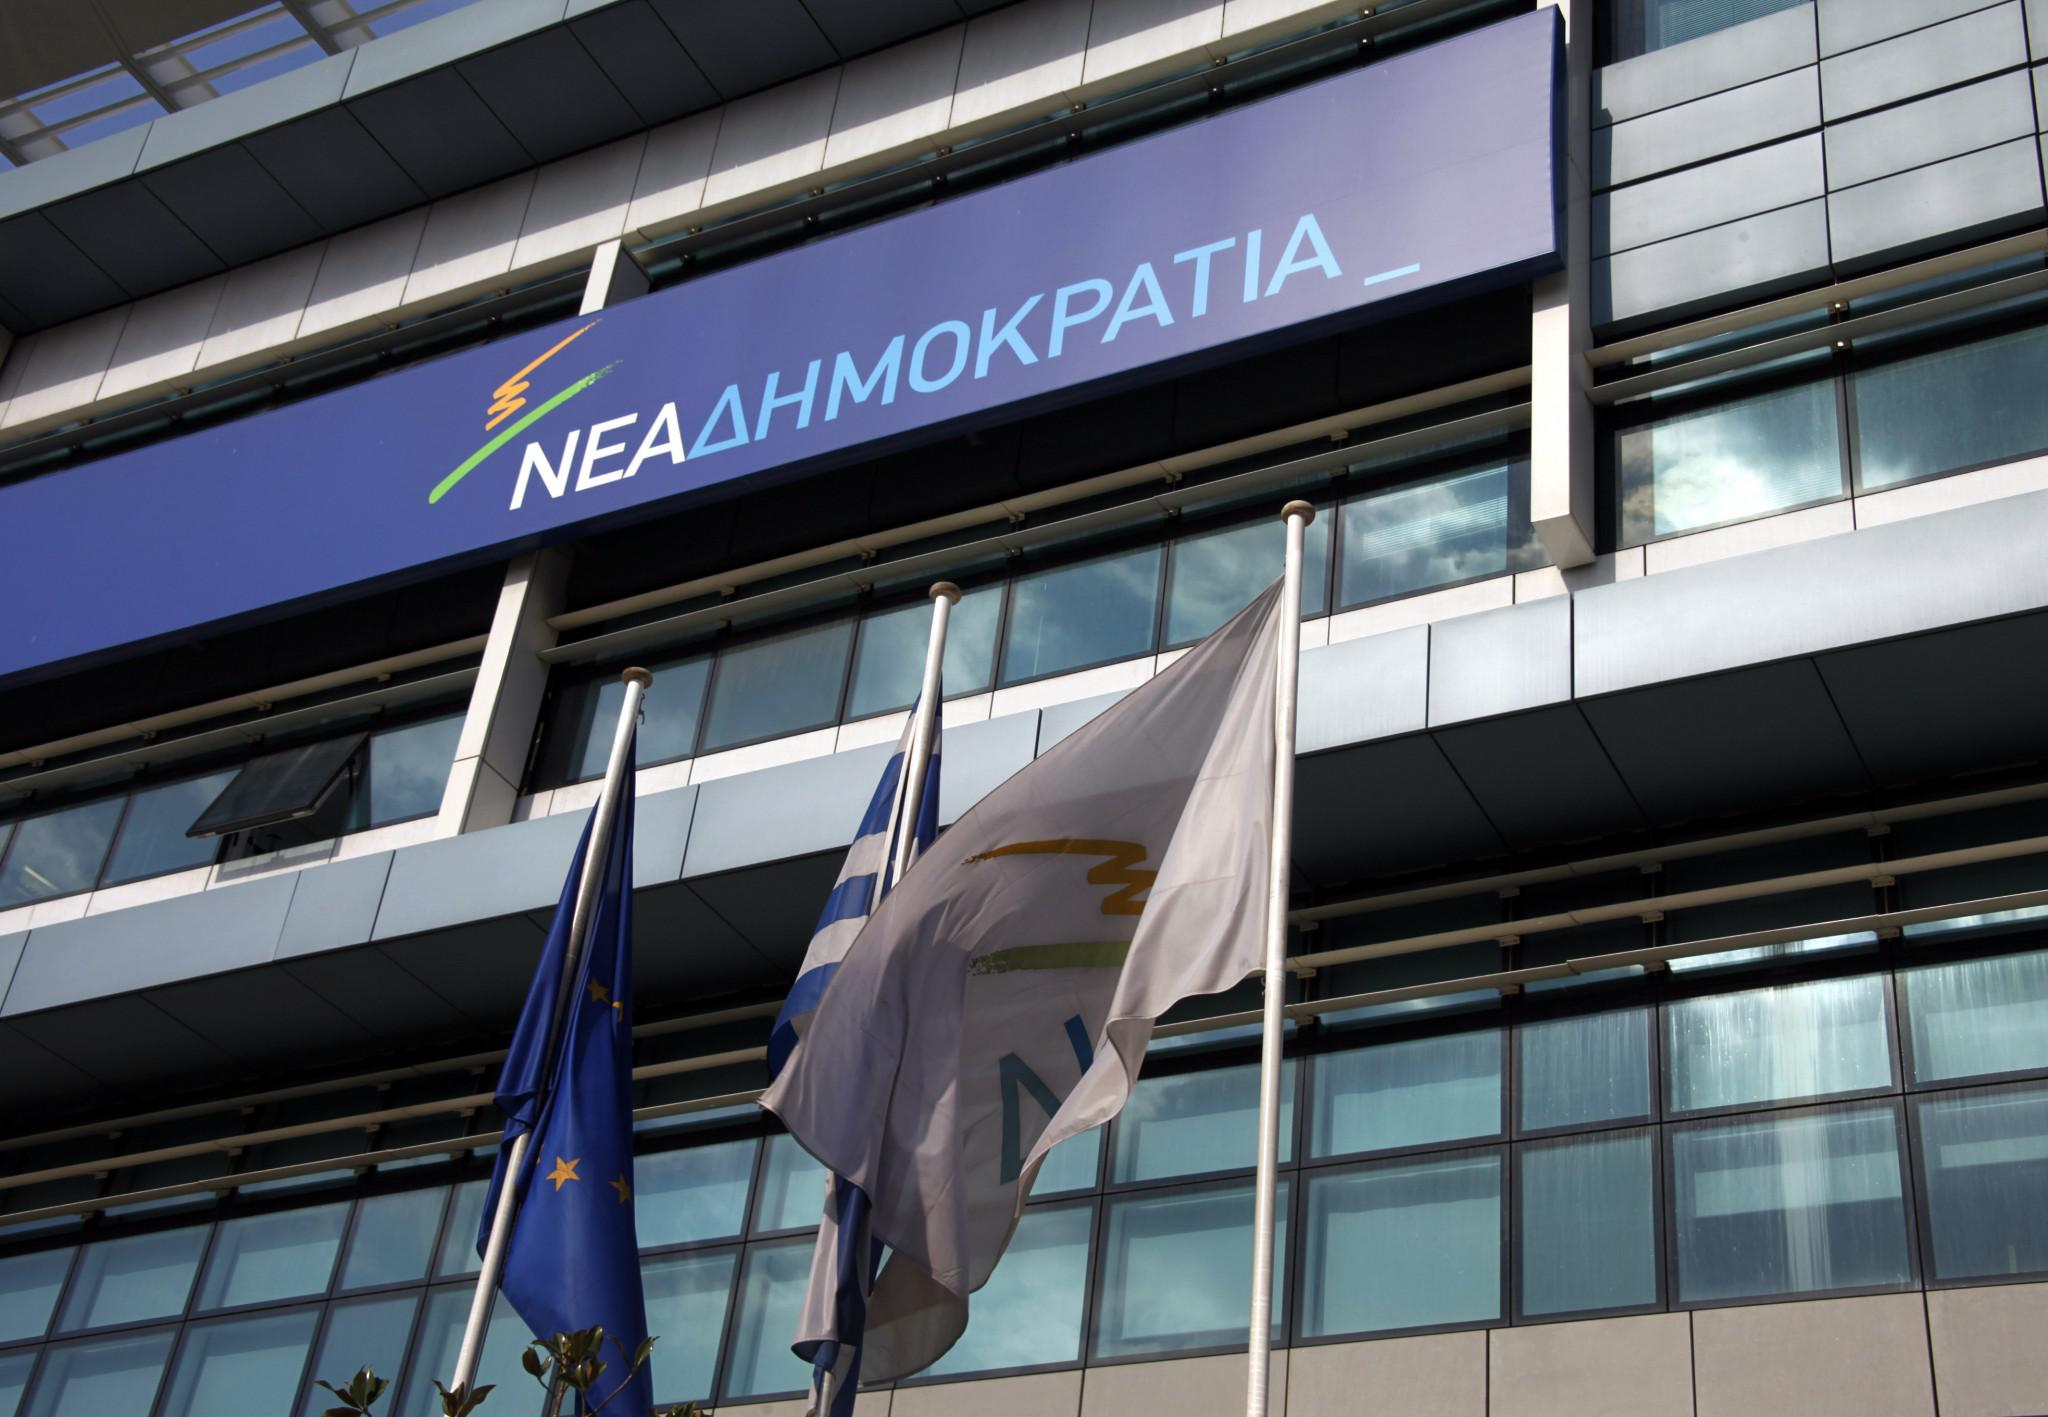 http://www.eleftherostypos.gr/wp-content/uploads/2016/06/neadimokratia_0_0-2.jpg